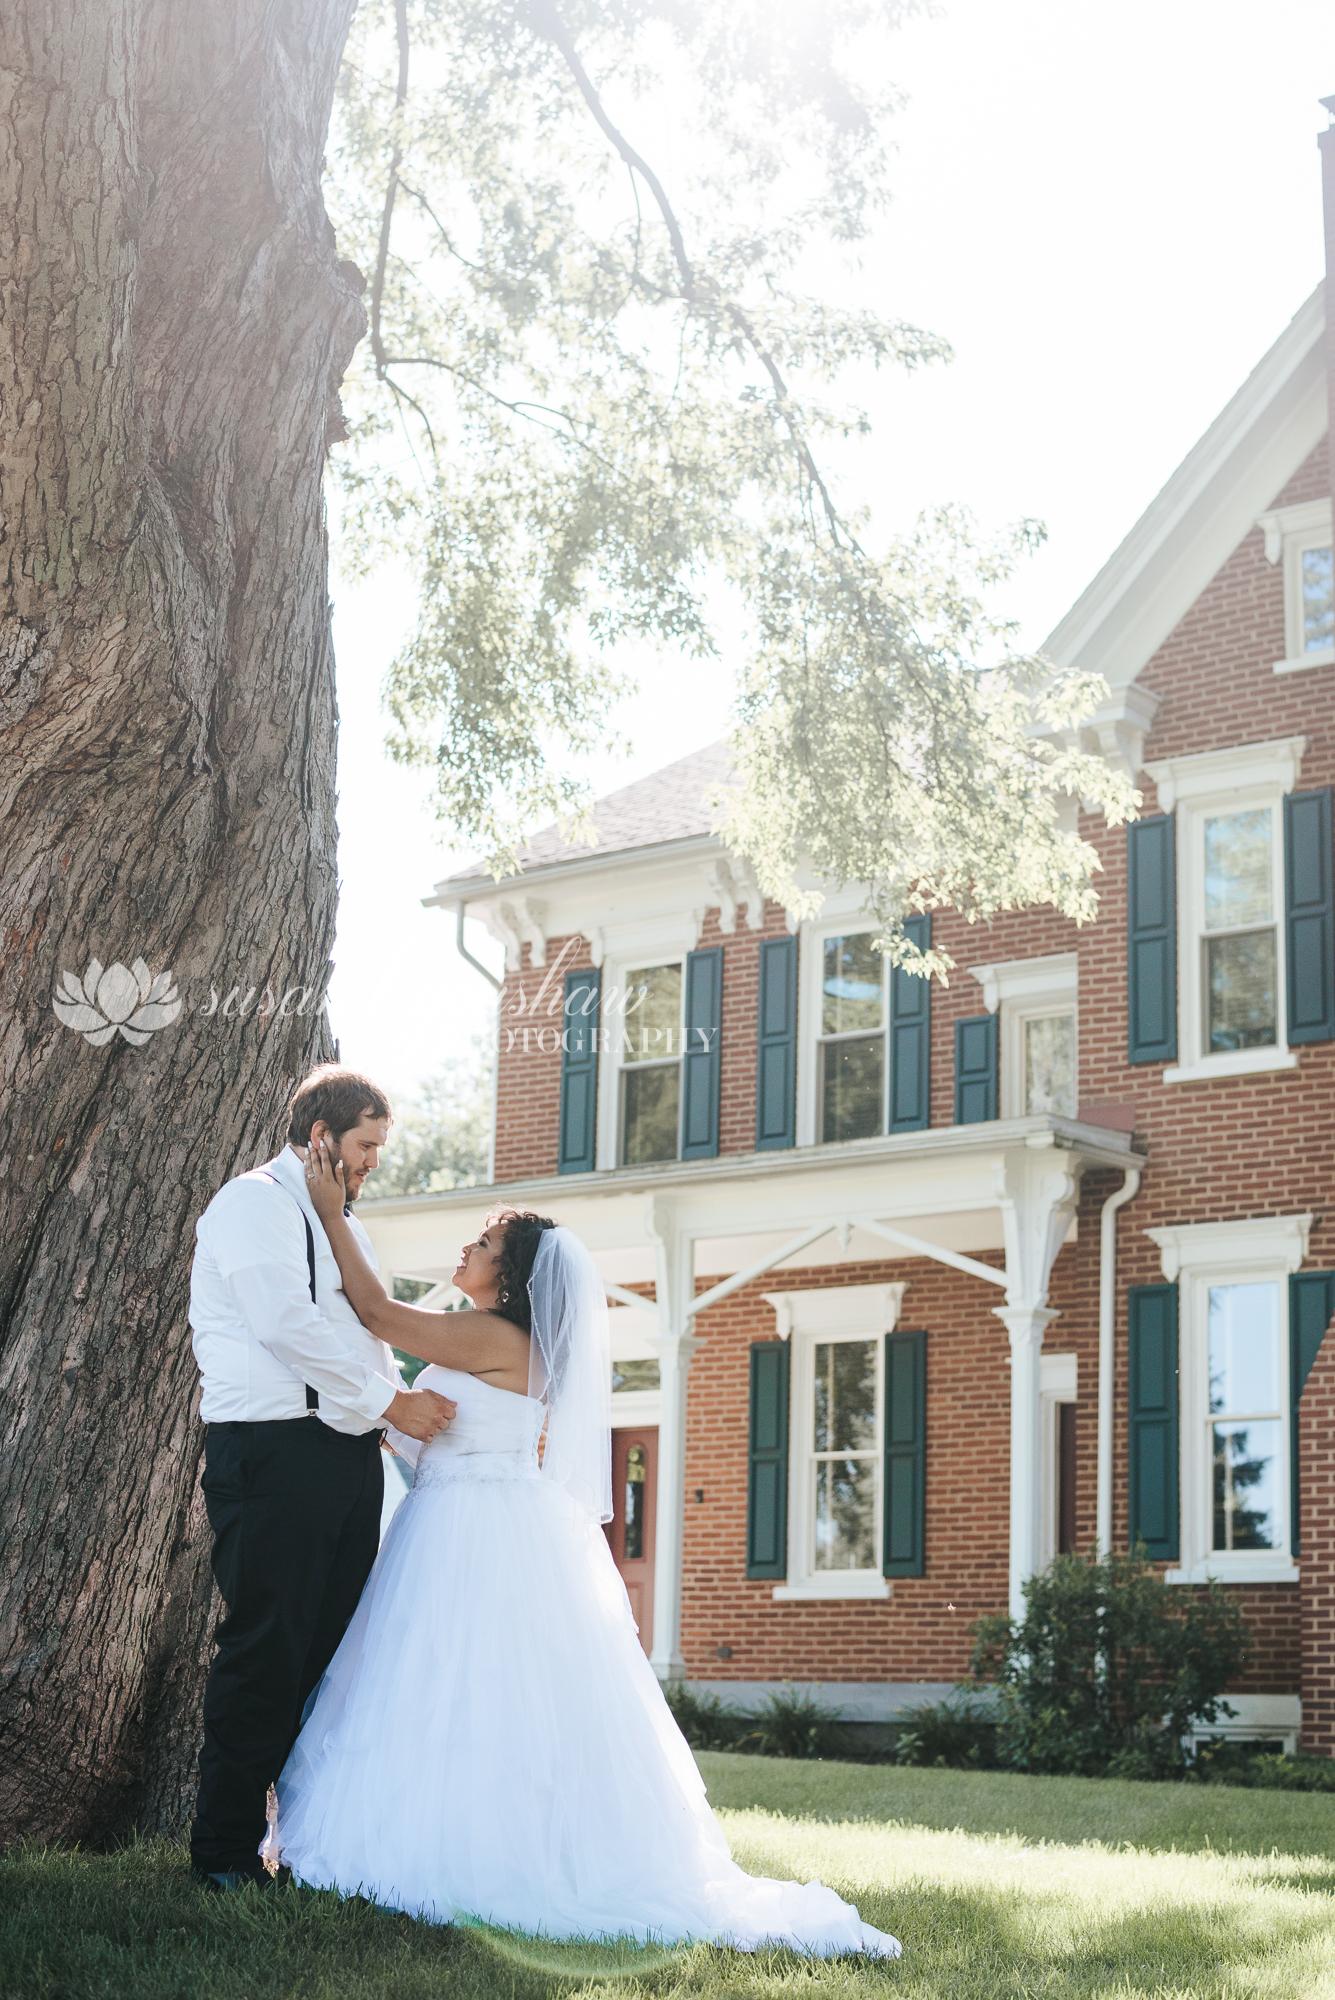 Katelyn and Wes Wedding Photos 07-13-2019 SLY Photography-98.jpg